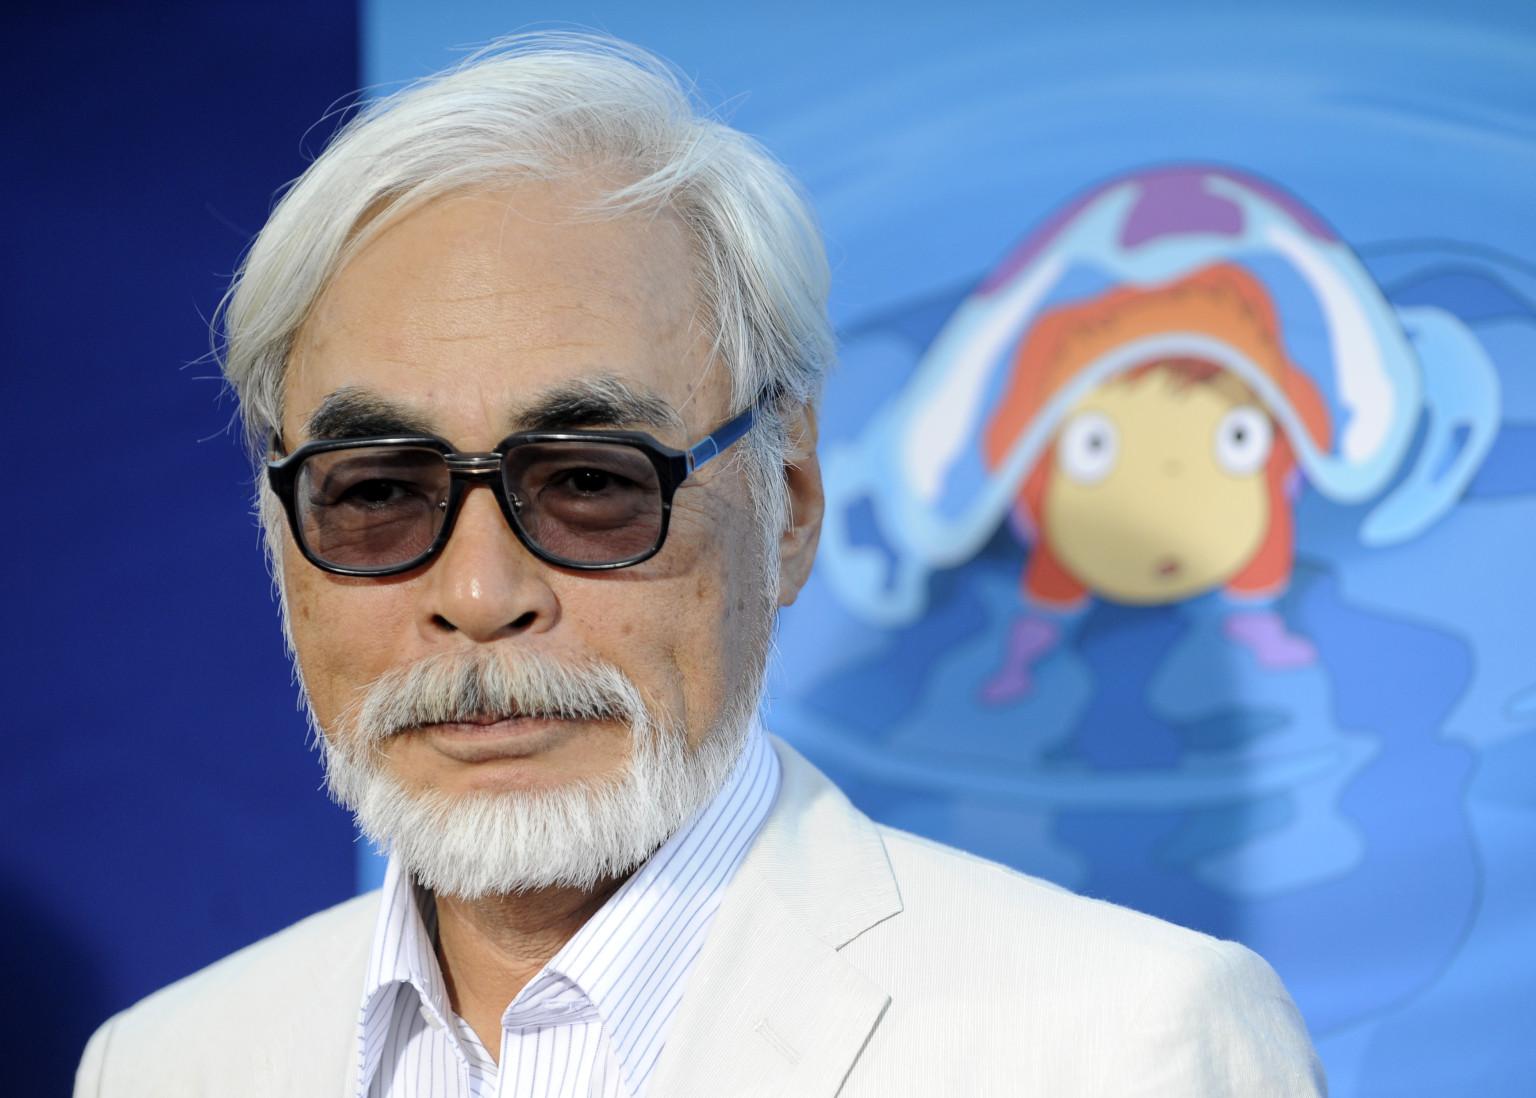 hayao miyazaki music